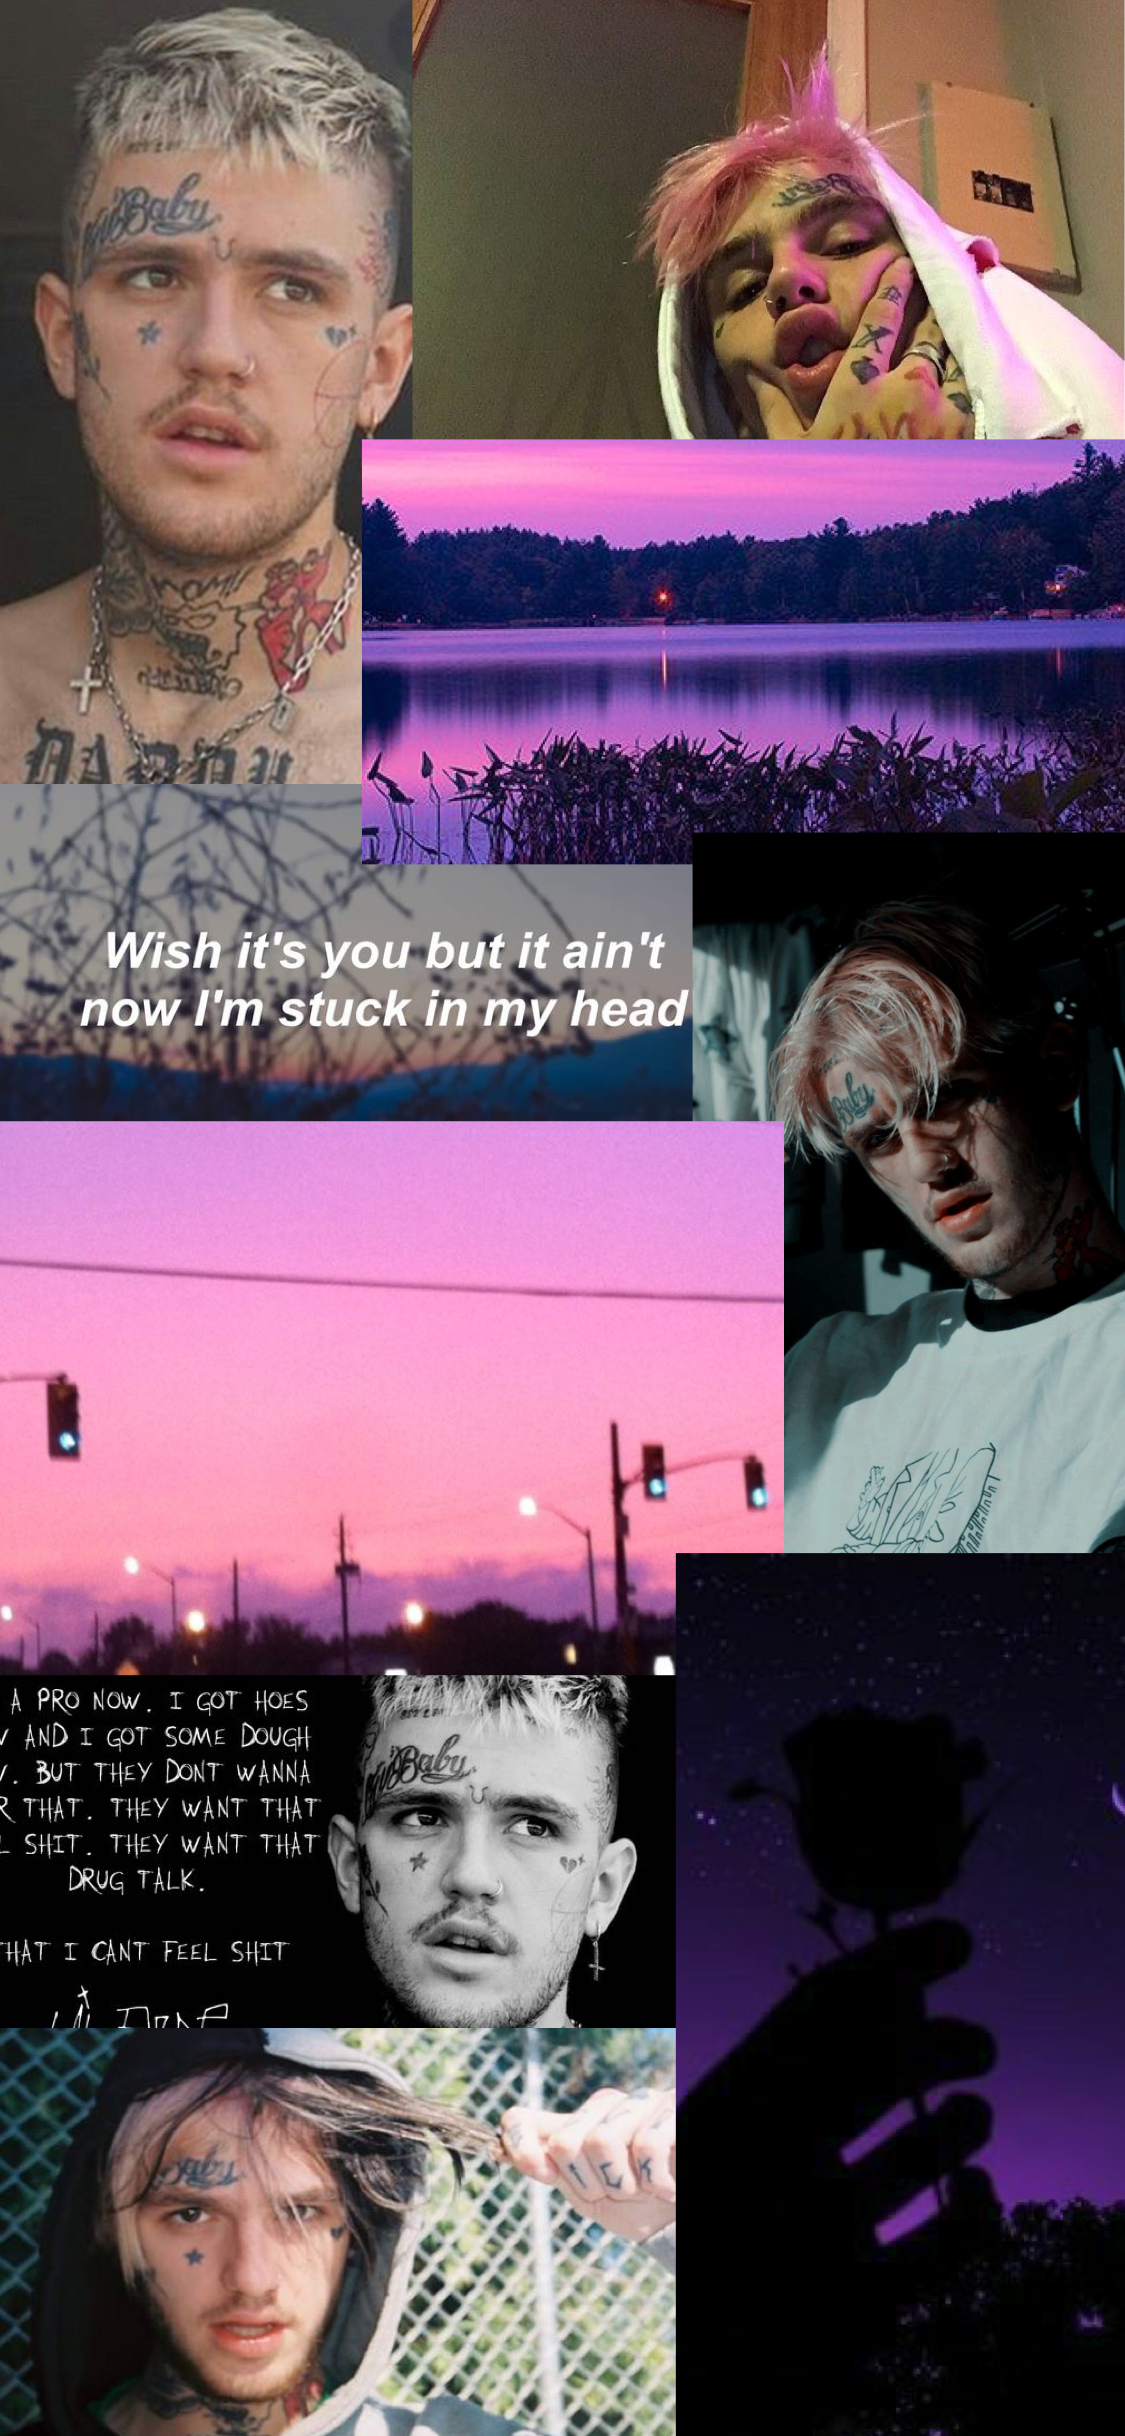 Lil Peep Iphone 11 Pro Wallpaper Lil Peep Beamerboy Lil Peep Hellboy My Chemical Romance Wallpaper